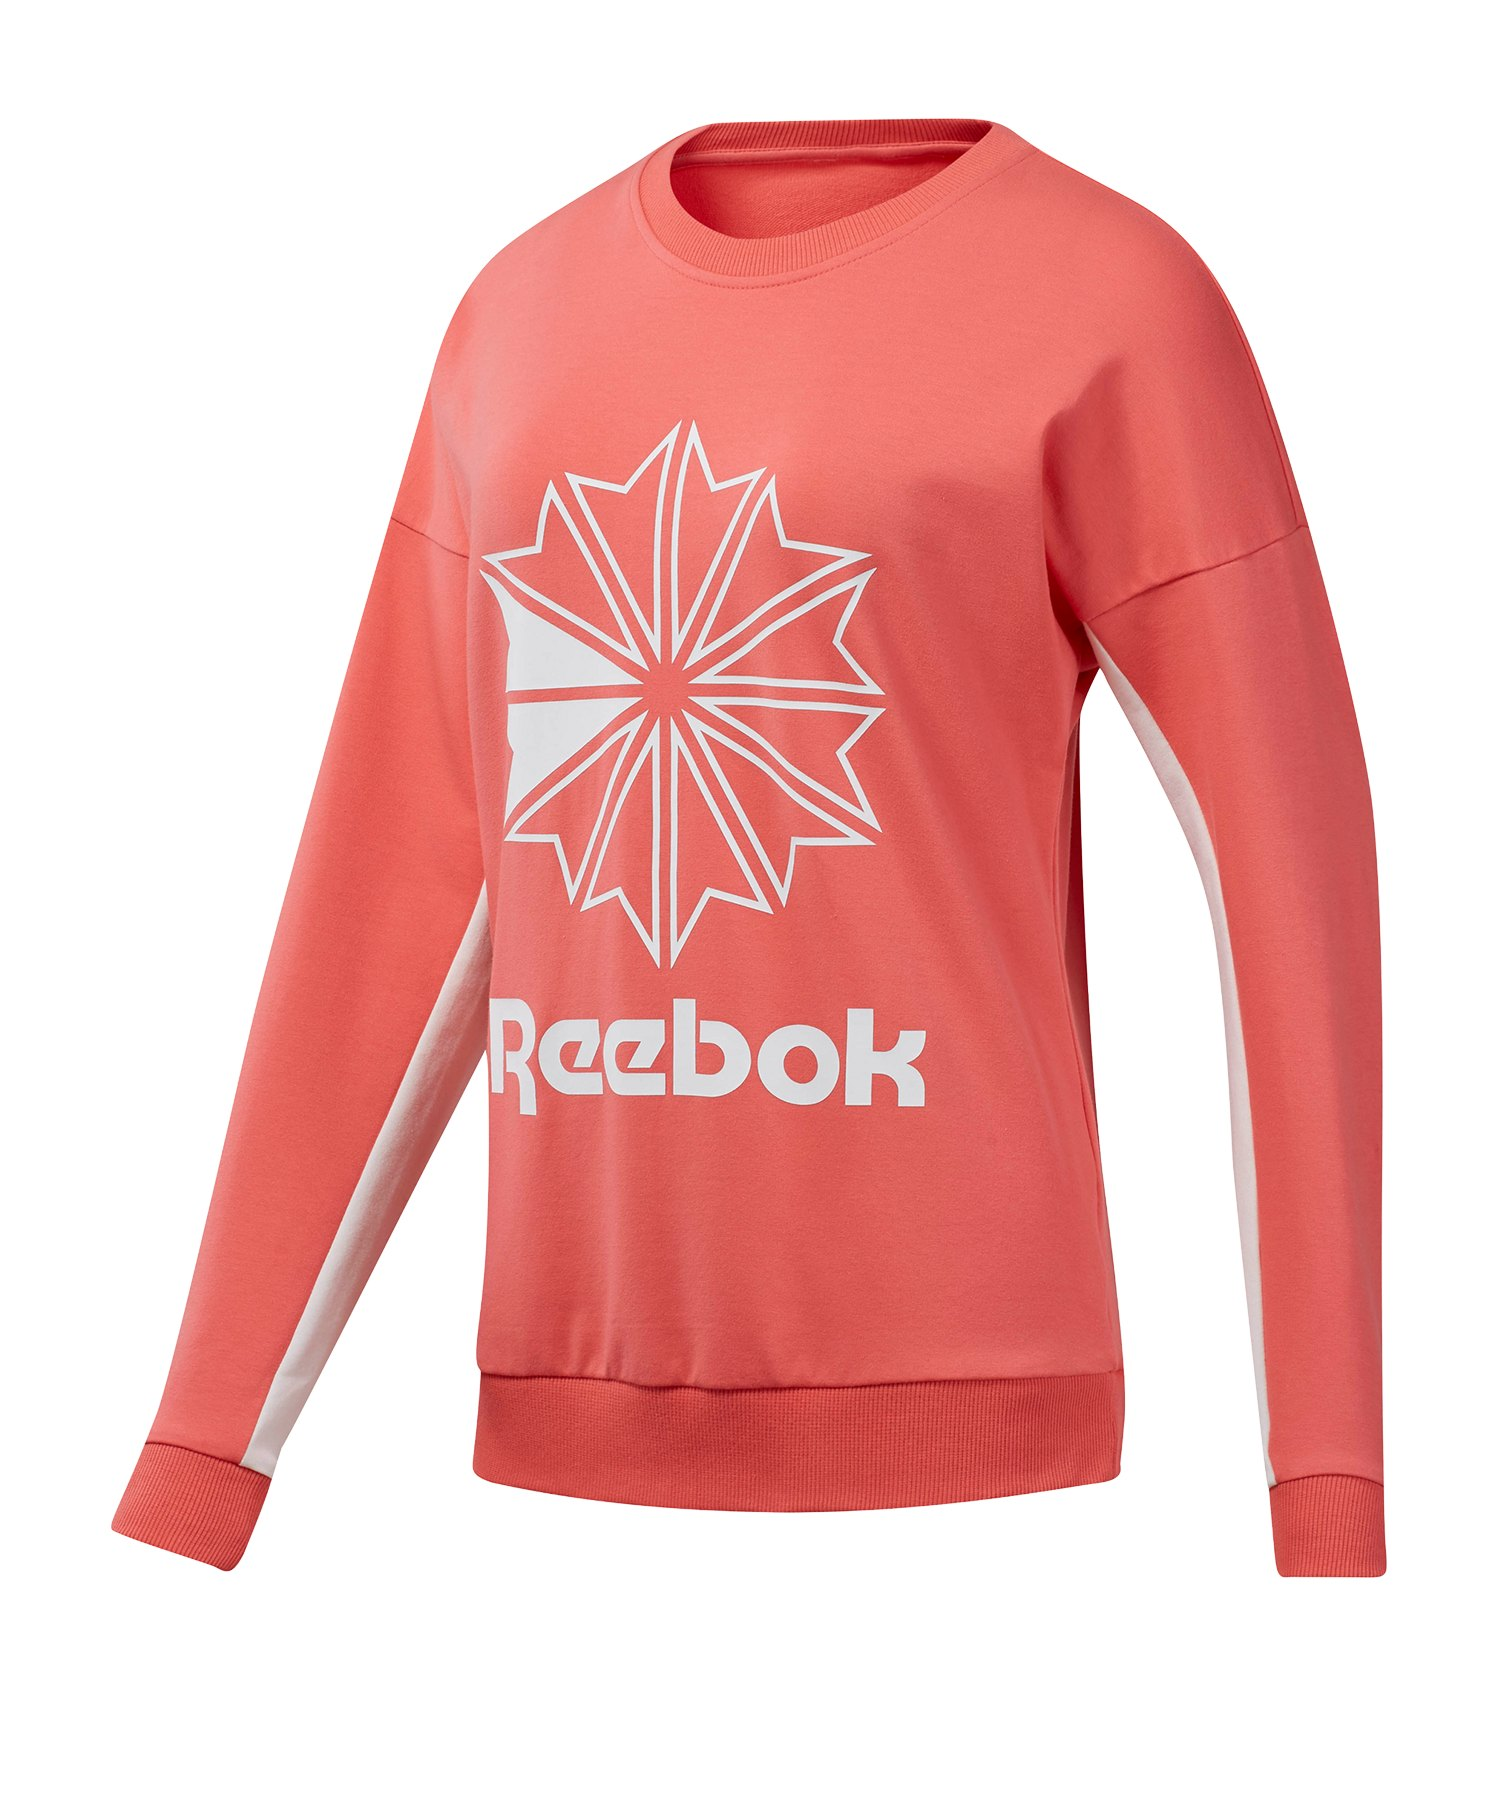 Reebok Classics FT Big Logo Sweatshirt Damen Pink - pink